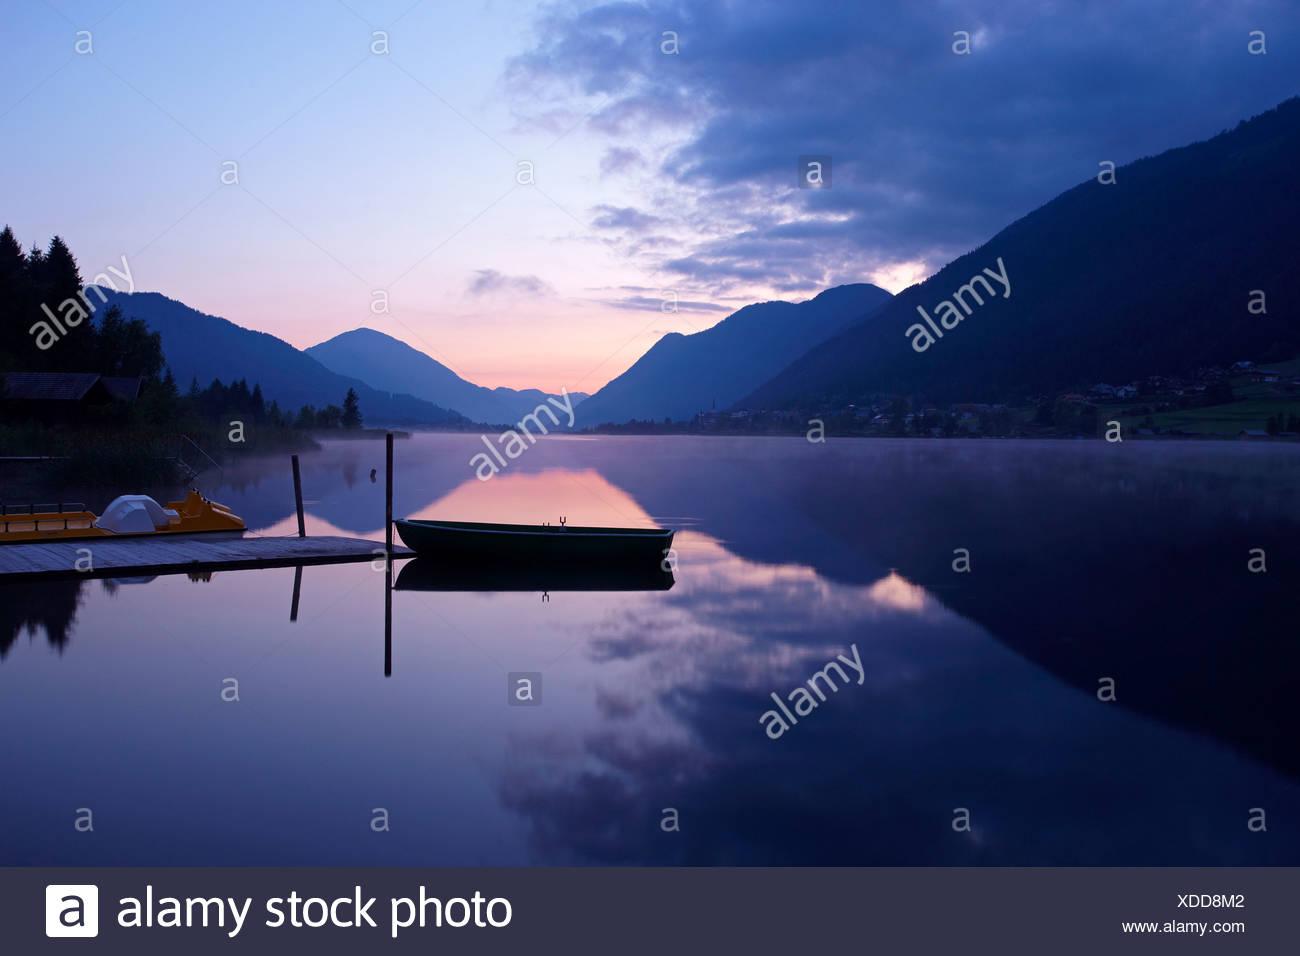 Morning mood at Weissensee Lake, Carinthia, Austria, Europe Stock Photo